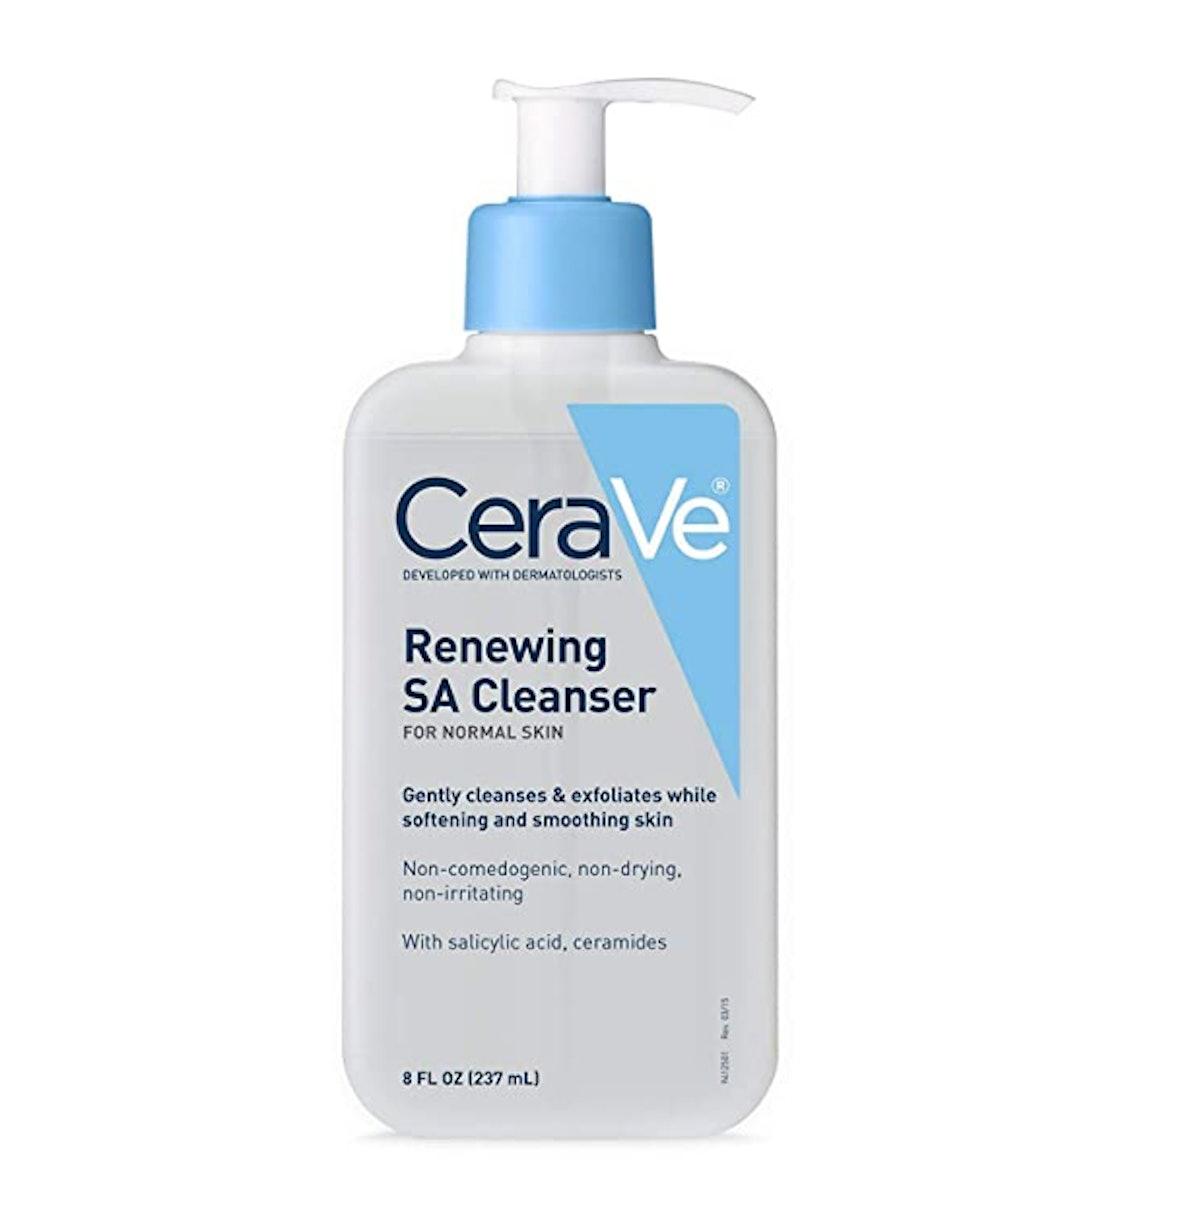 CeraVe SA Cleanser Salicylic Acid Face Wash